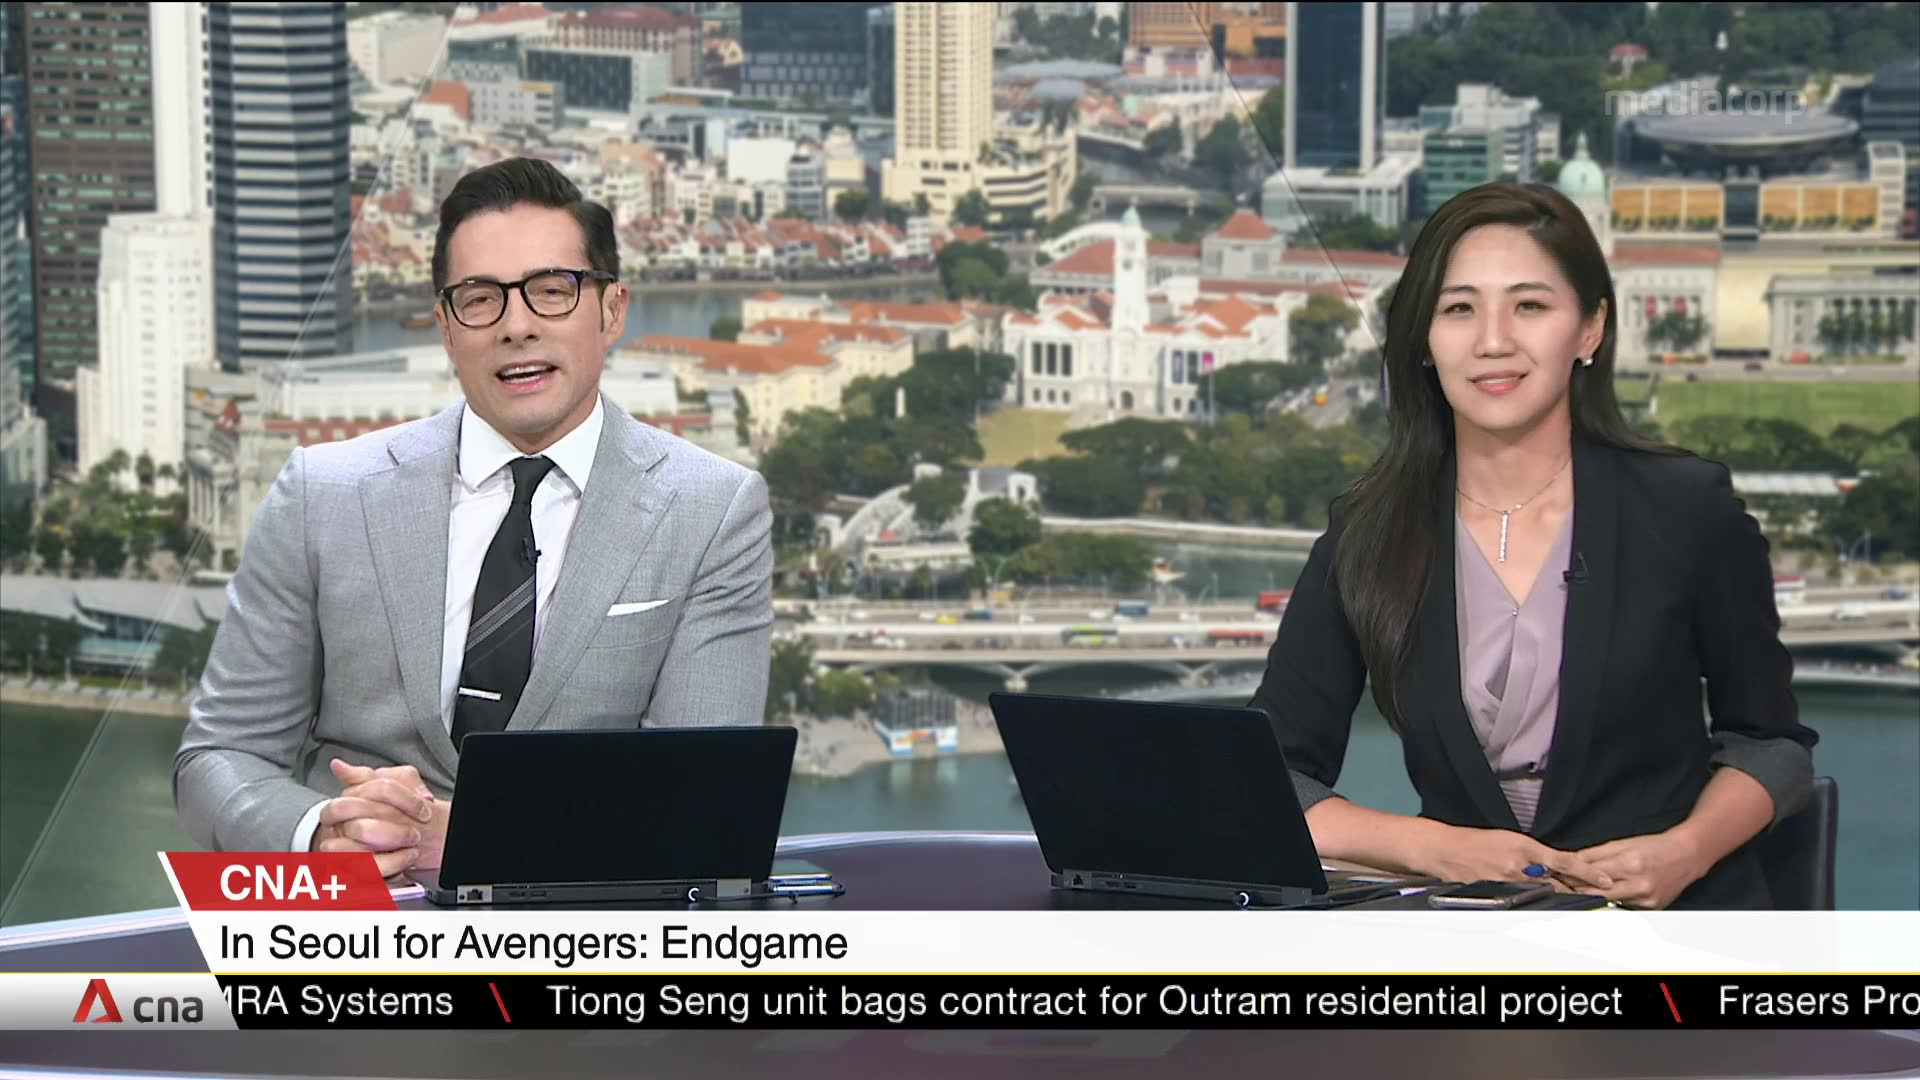 CNA+ Lifestyle: Avengers Endgame